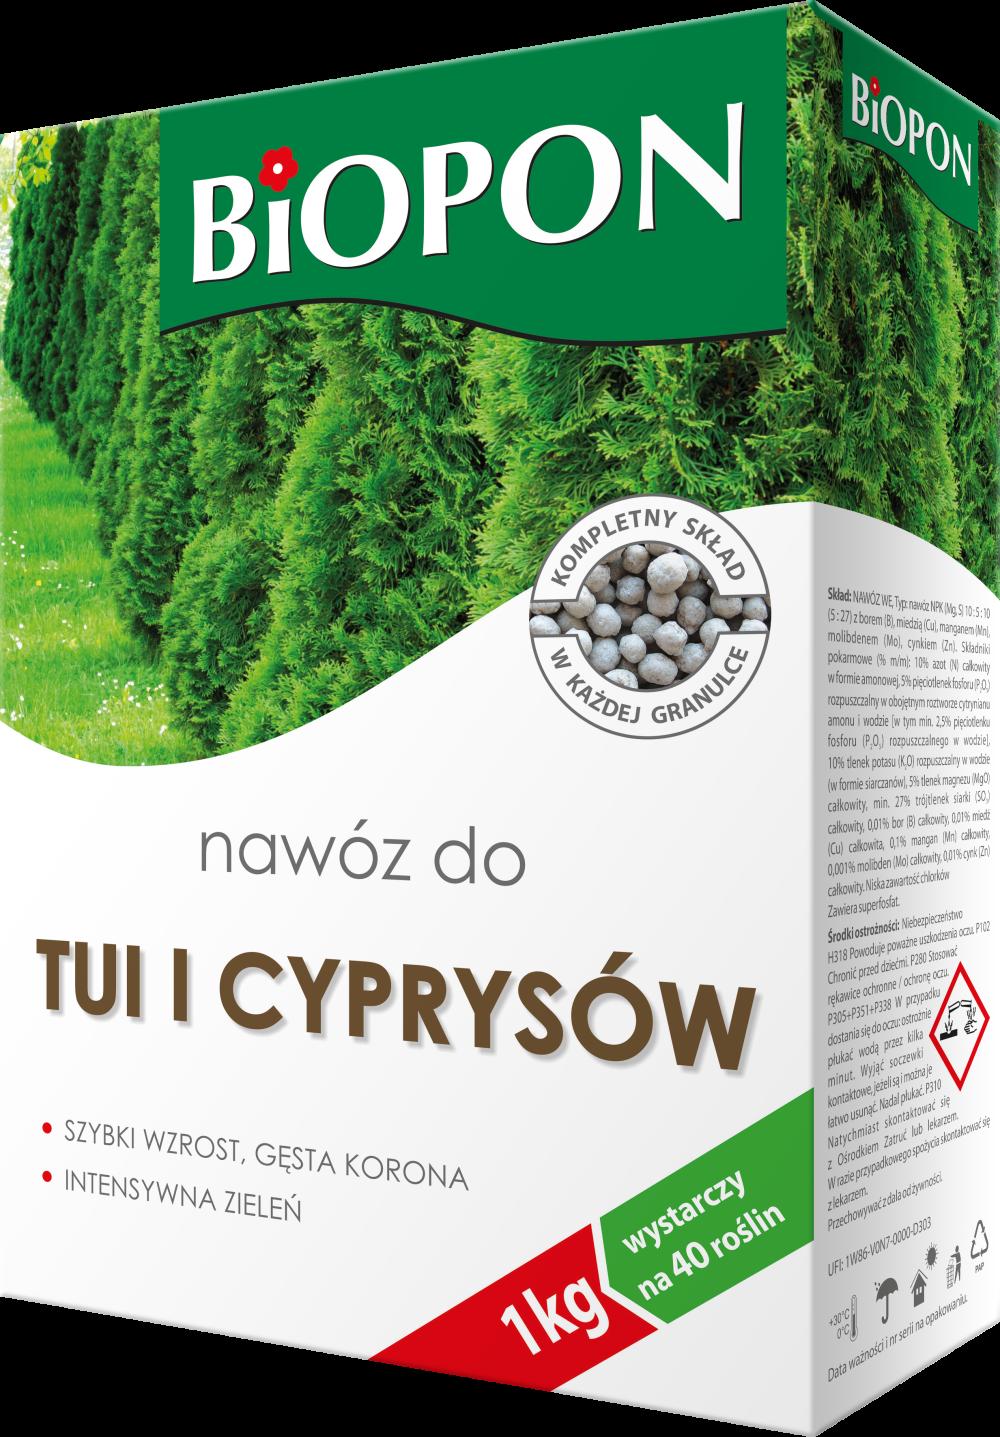 Biopon Arborvitae And Cypress Trees Fertilizer - Biopon Concime Biopon 1042 (1000x1437), Png Download